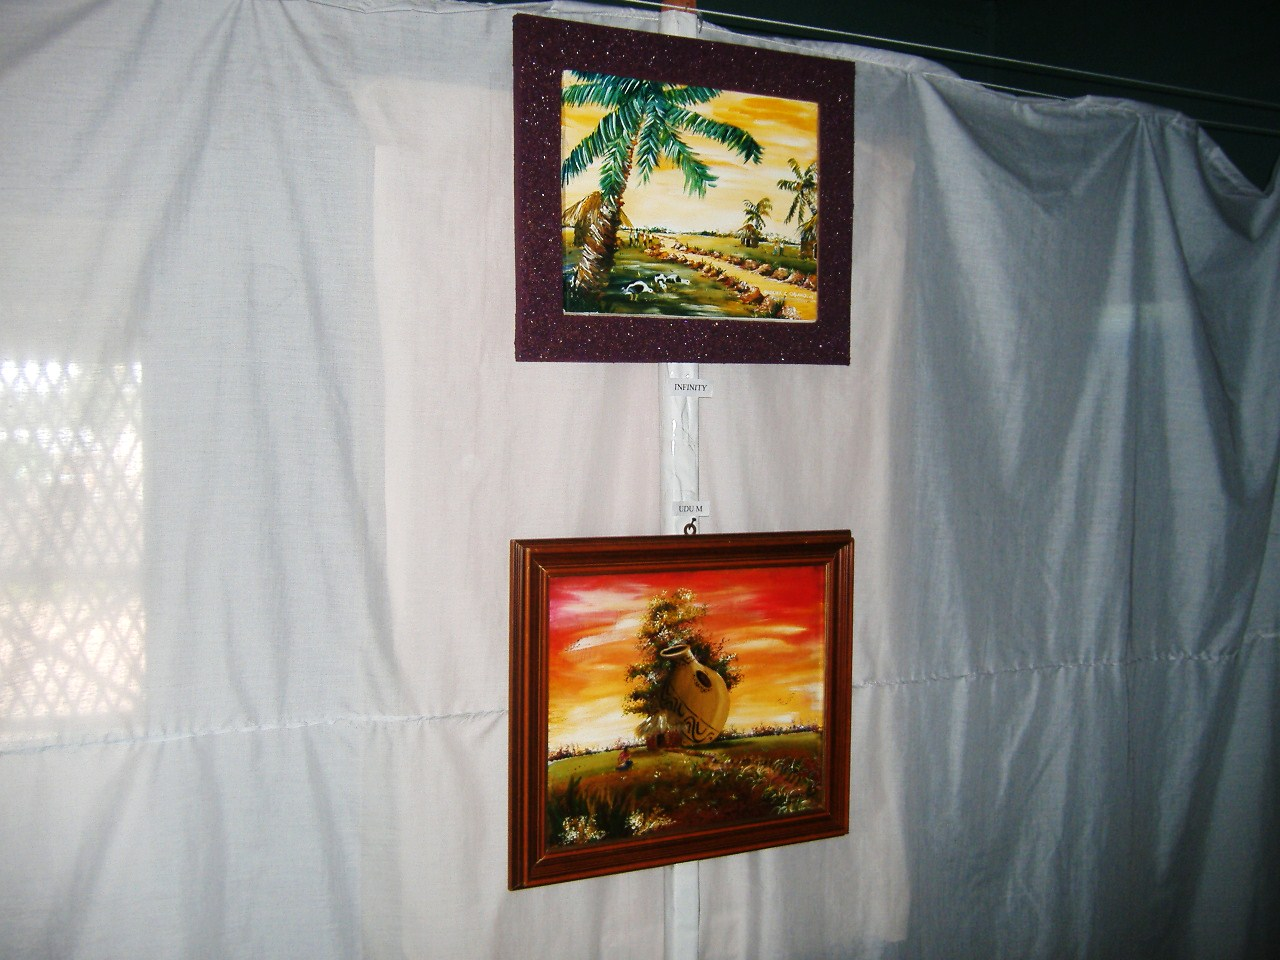 Paintings Of Local Scenes On Display